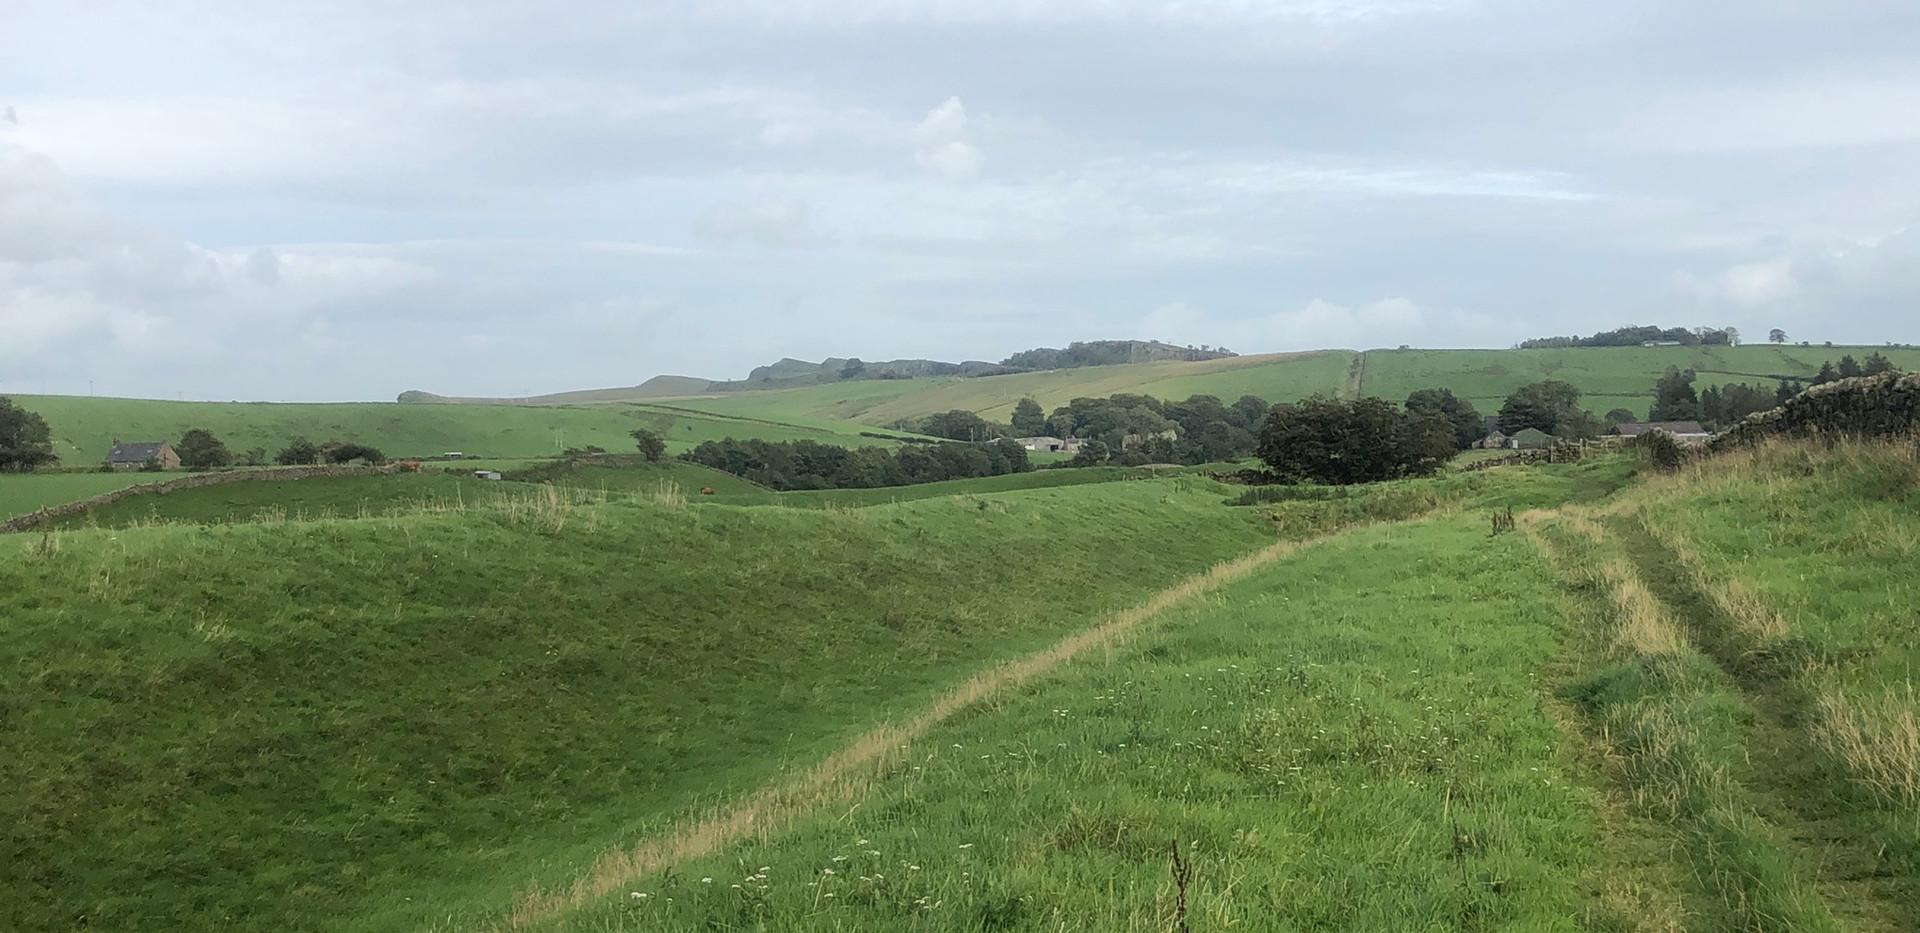 Big Hills on the Horizon